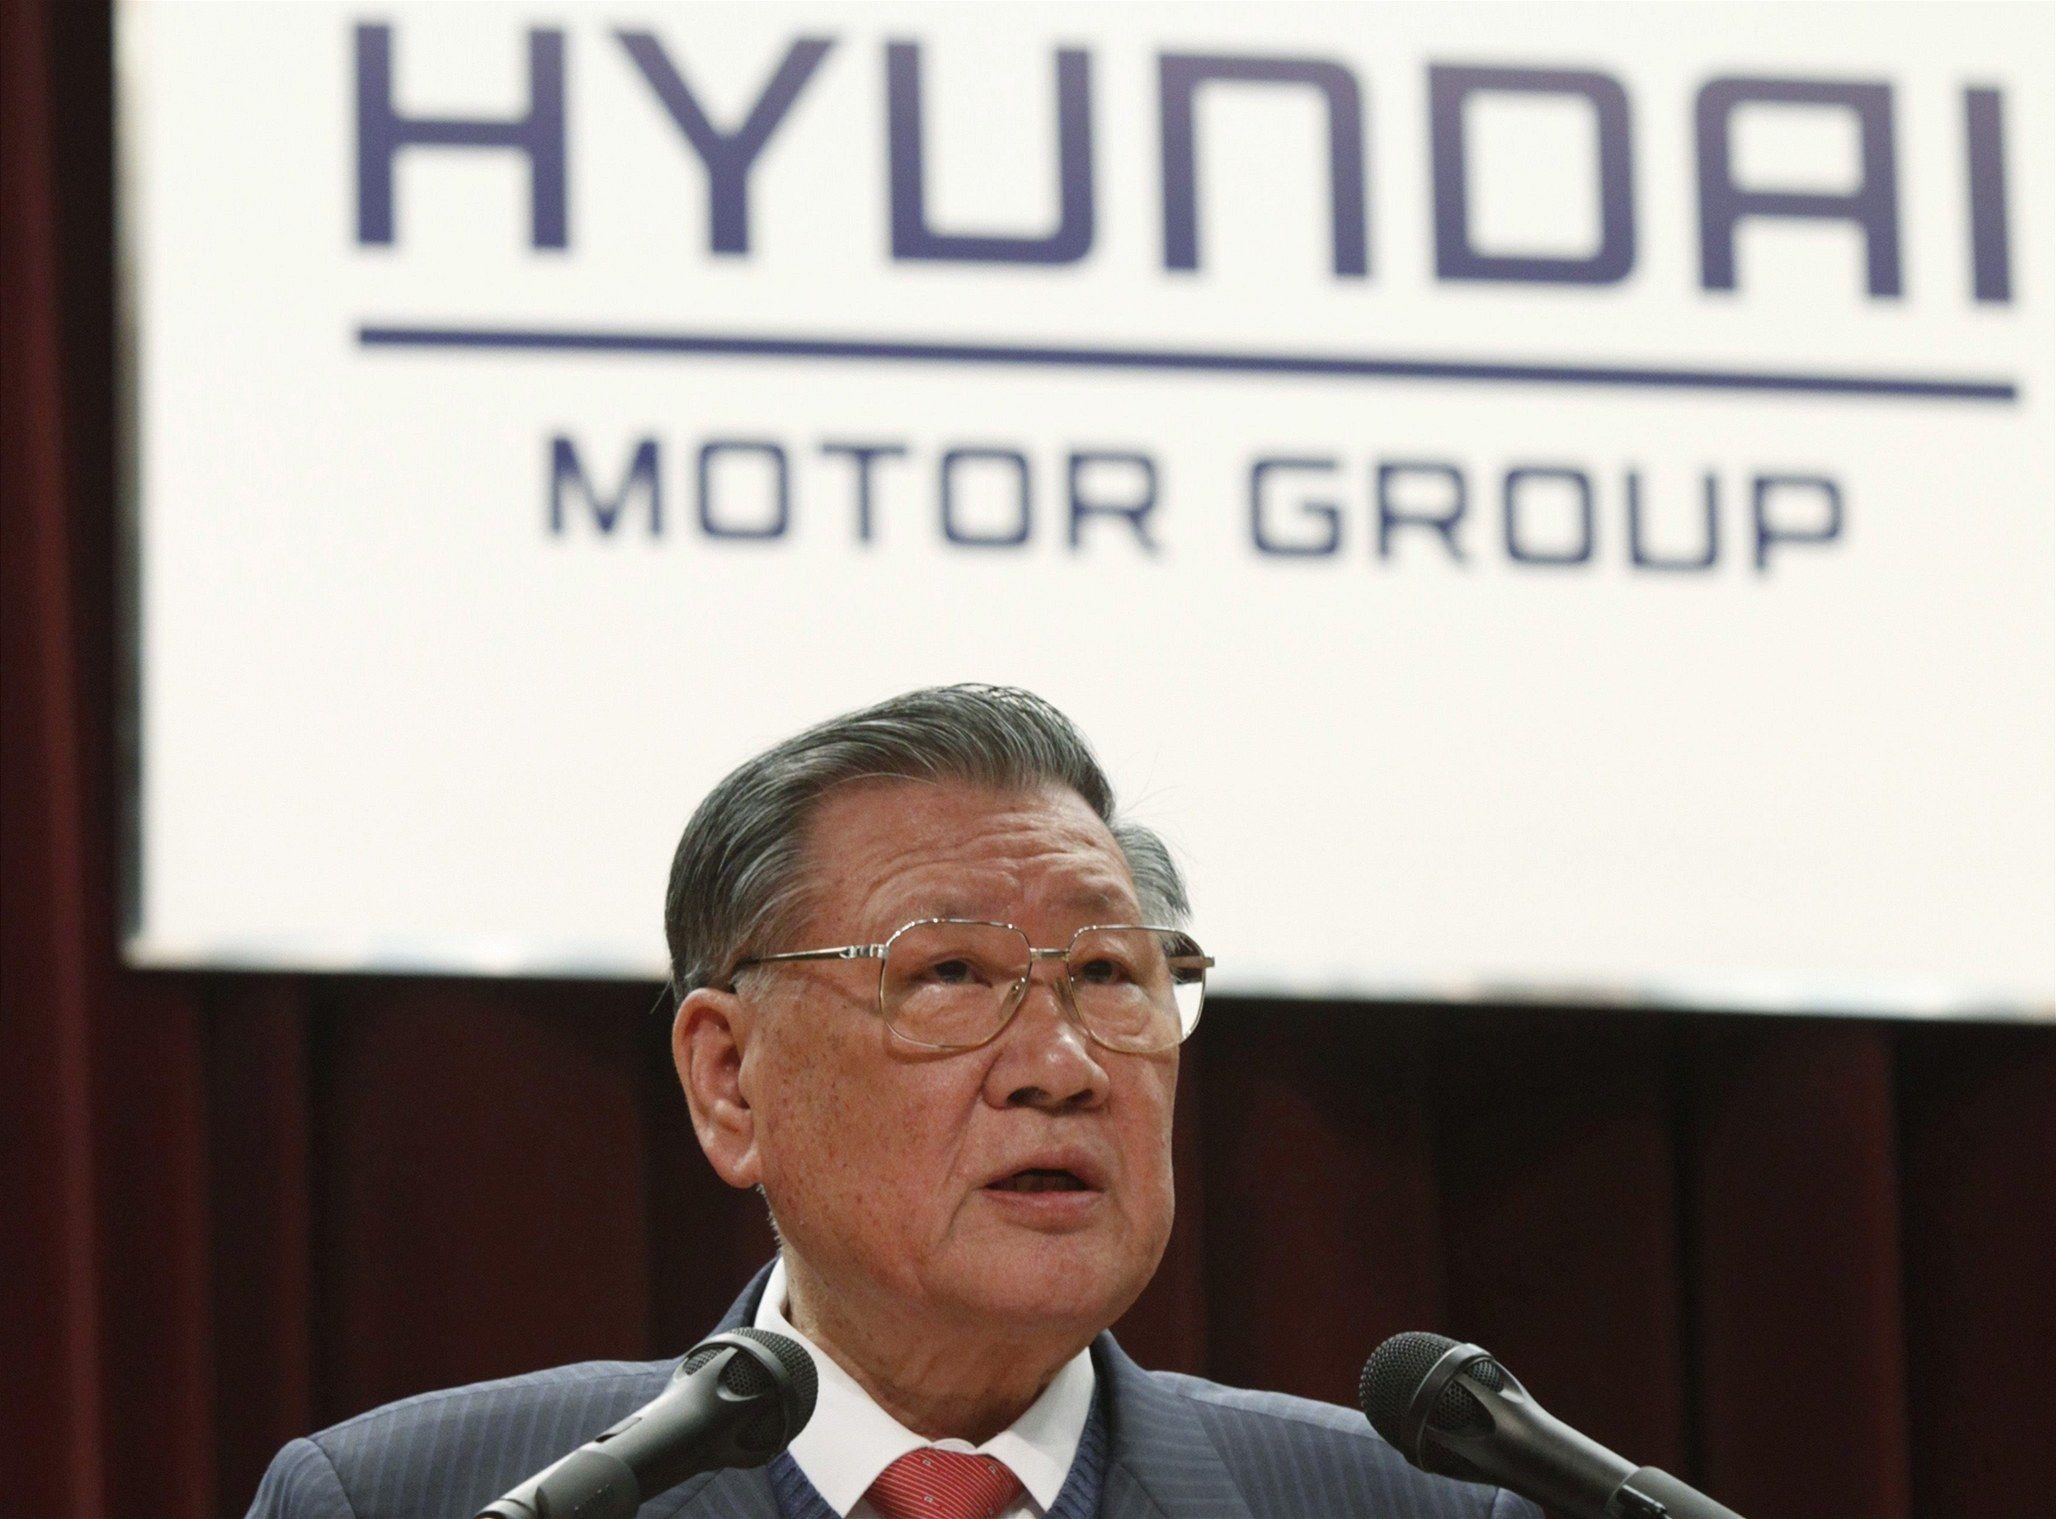 Чон Чжу Ен – основатель корпорации Hyundai